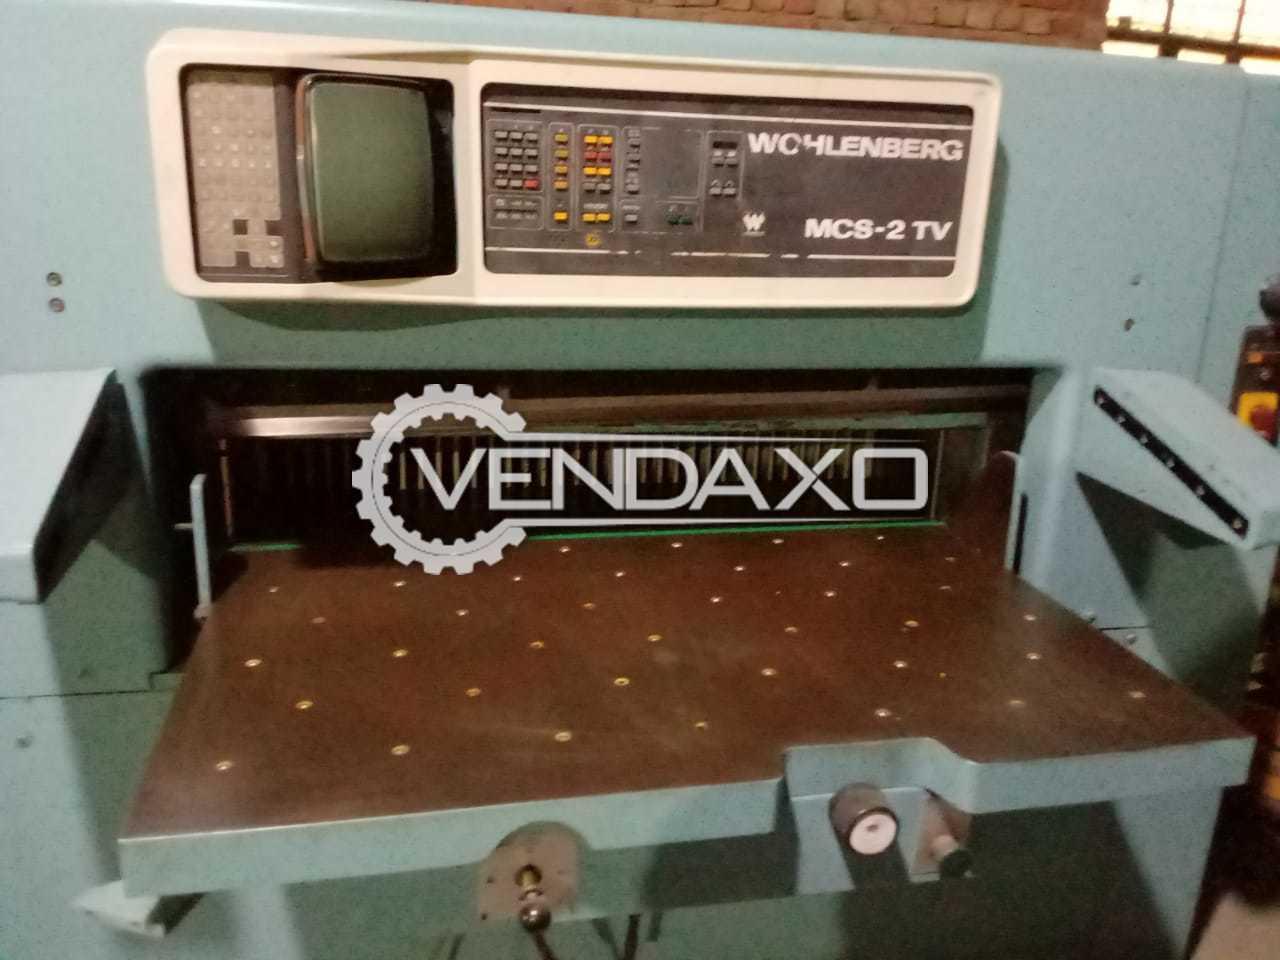 Wohlenberg MCS-2 TV Paper Cutting Machine - 45 Inch